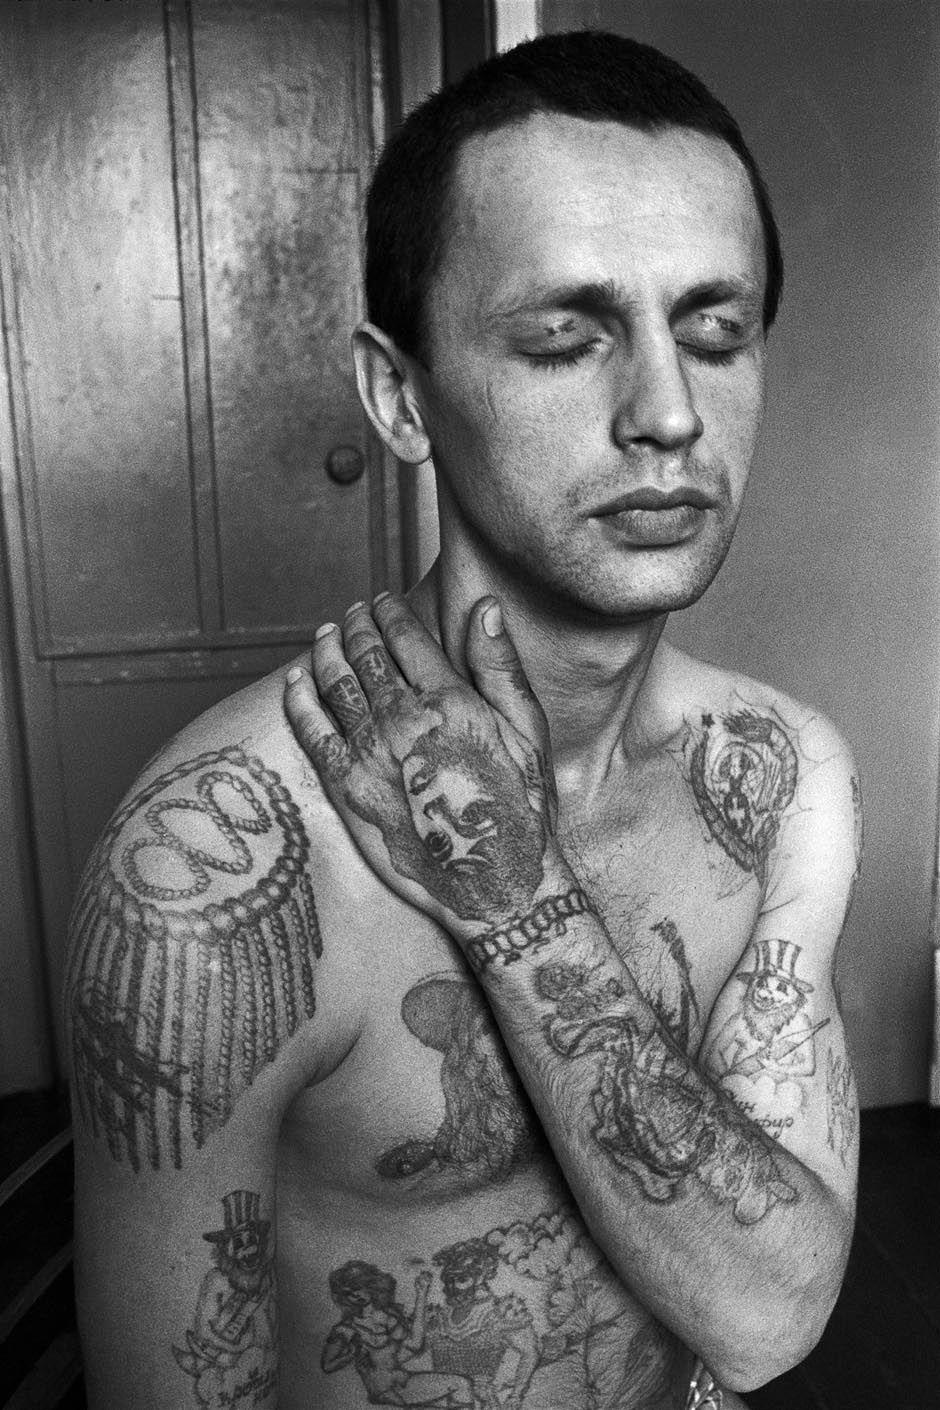 tatouage-encyclopedie-criminel-russe-prison-05.jpg